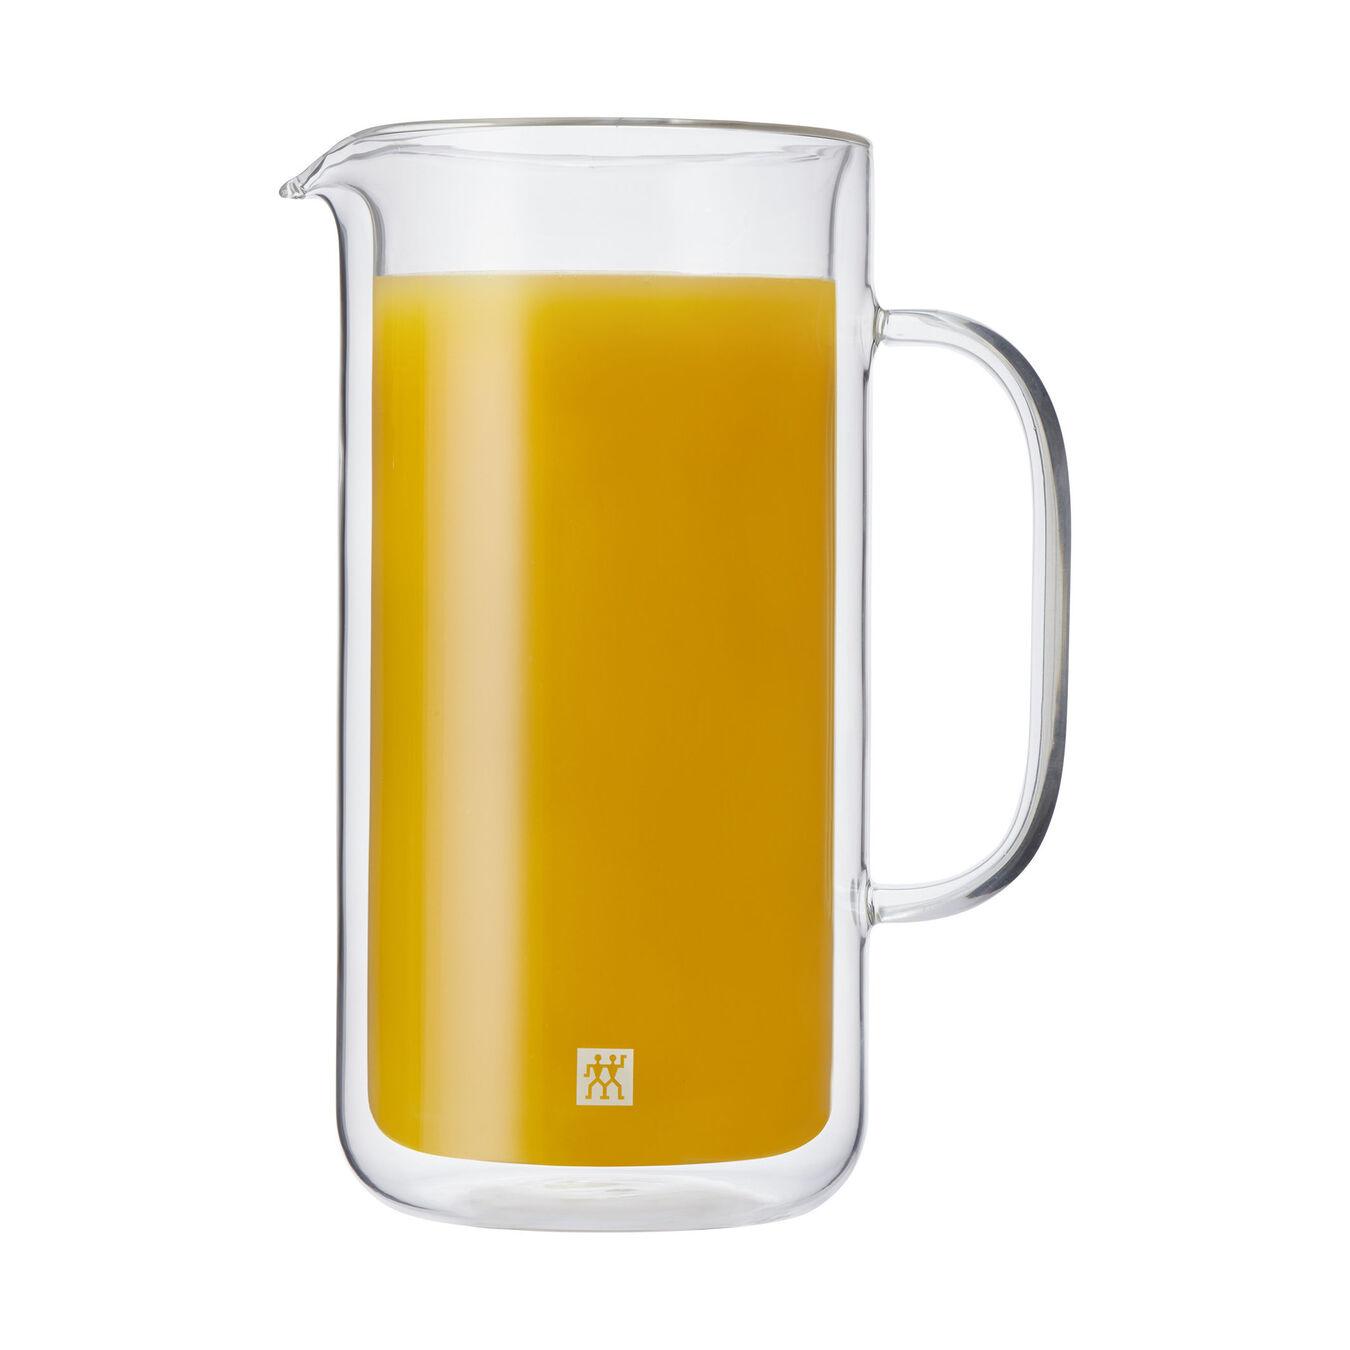 Carafe, 800 ml | Borosilicate glass,,large 1